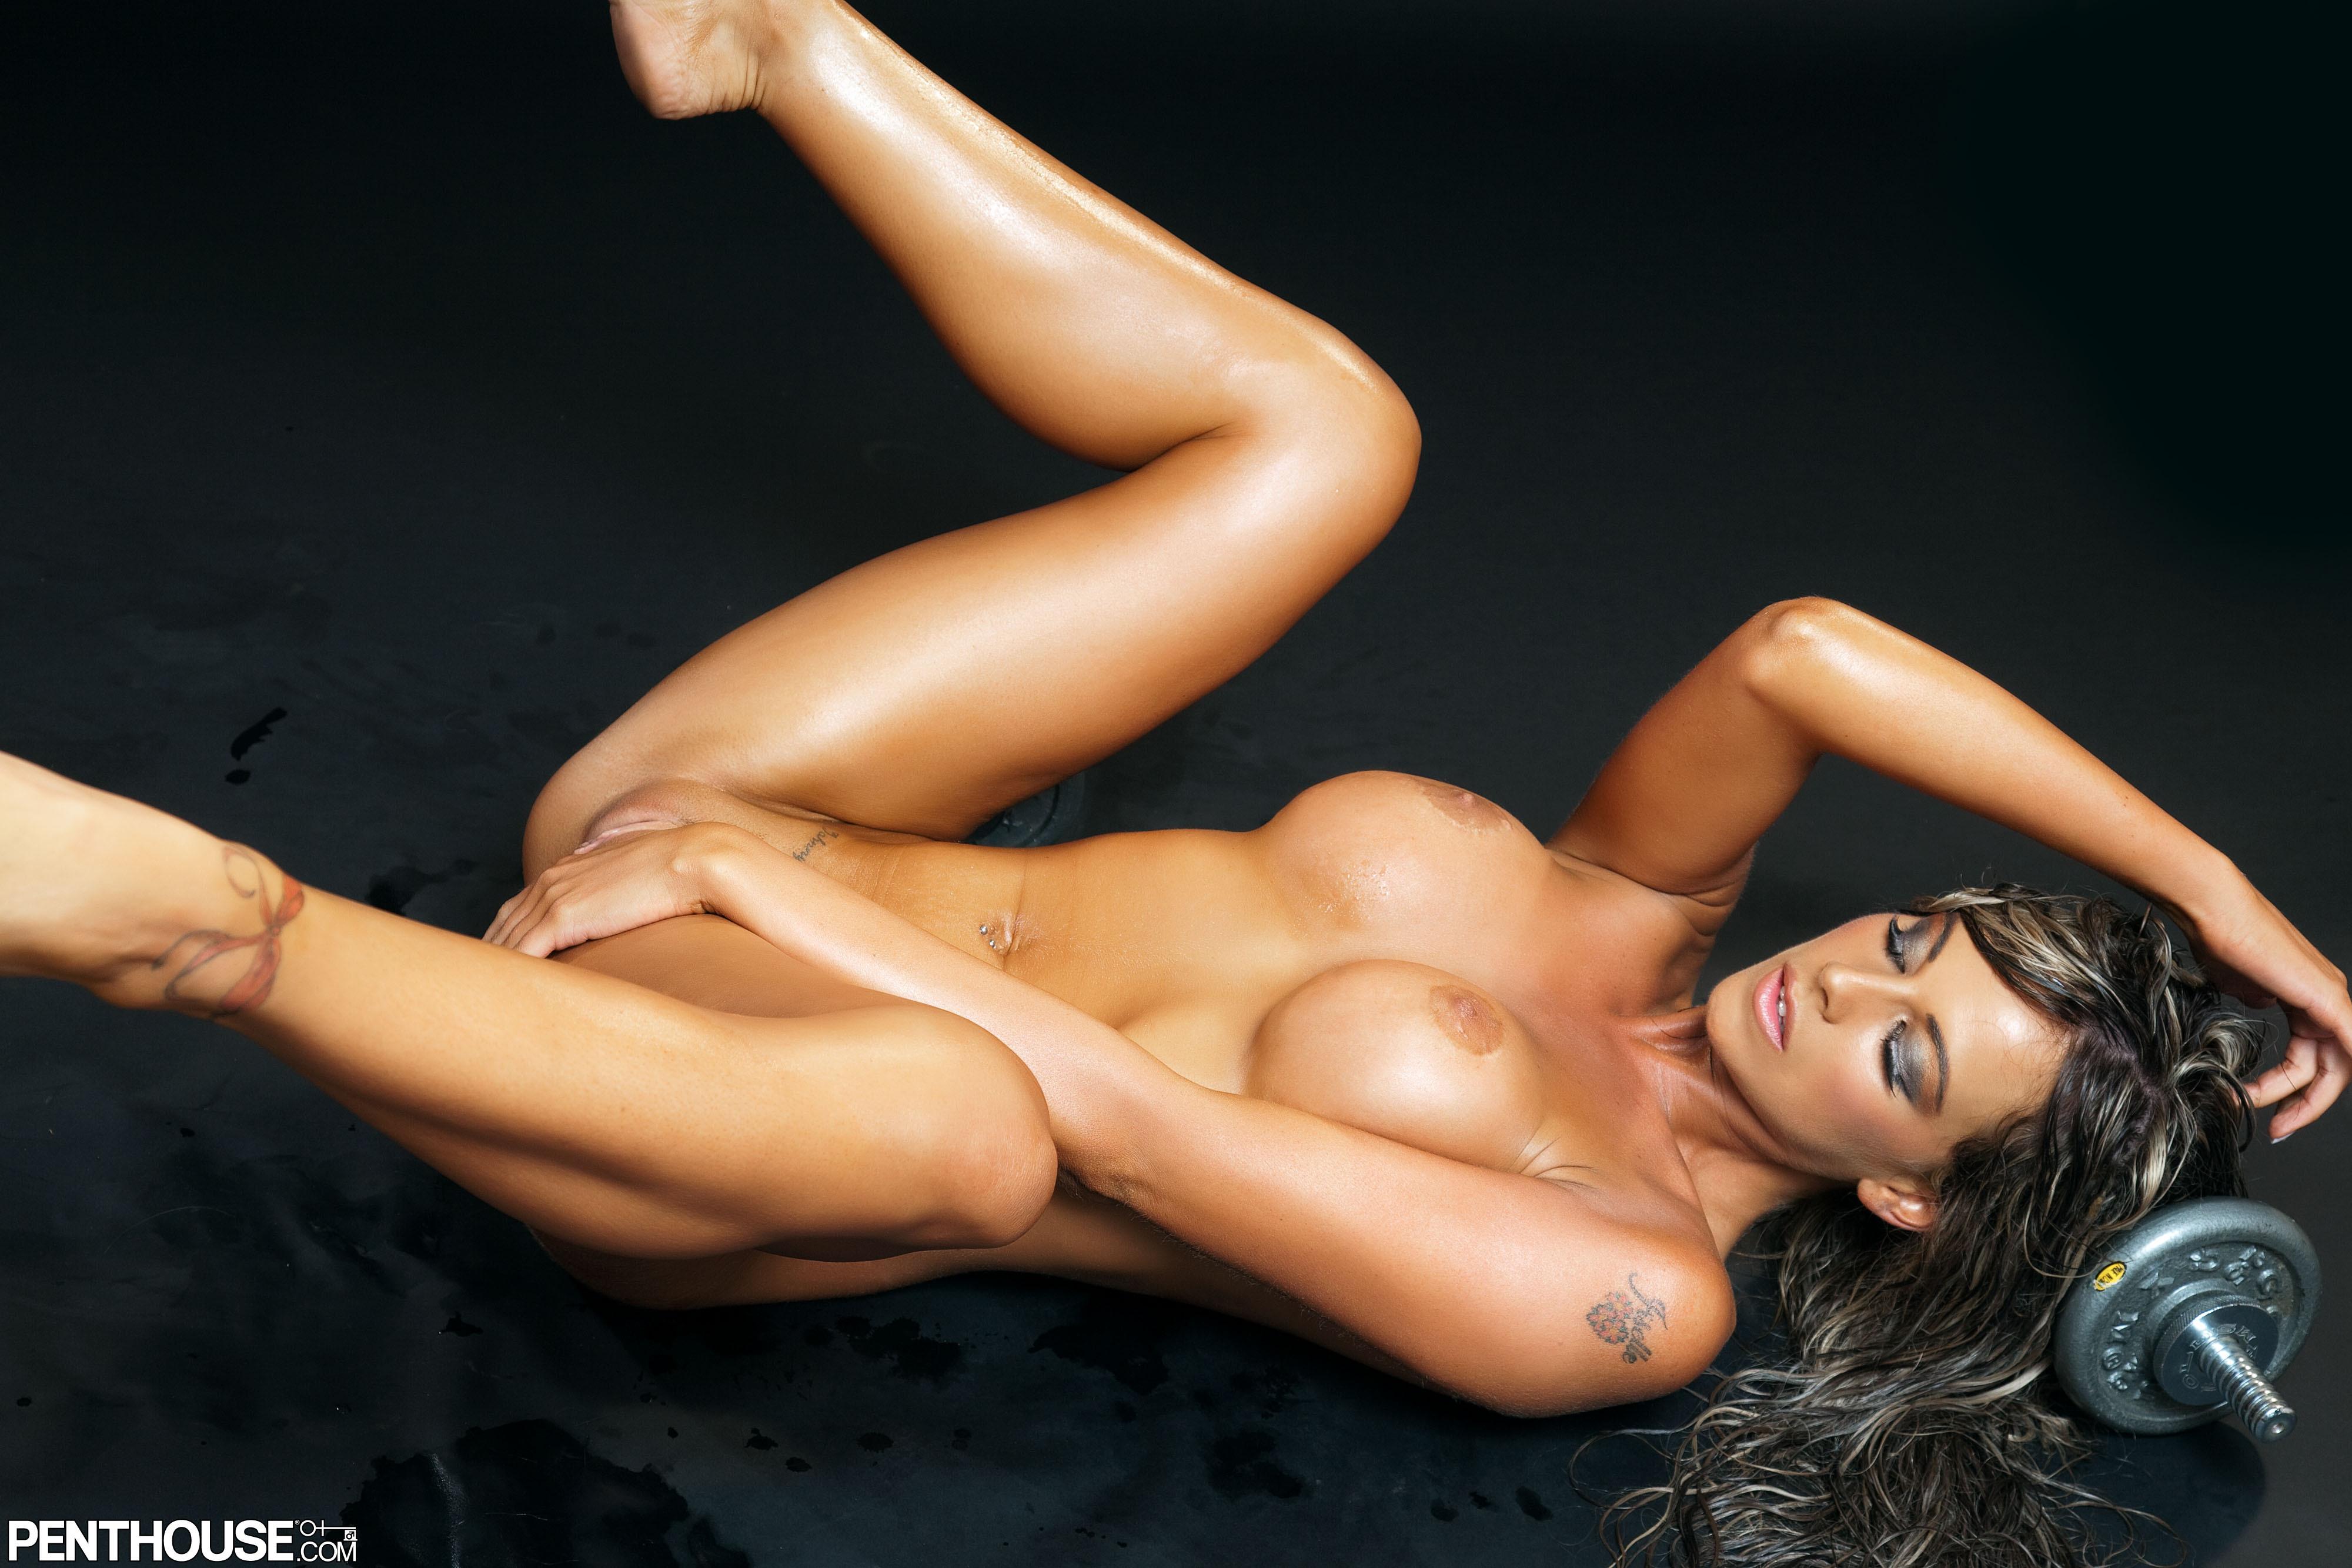 Hot nude erotic hd q porncraft galleries